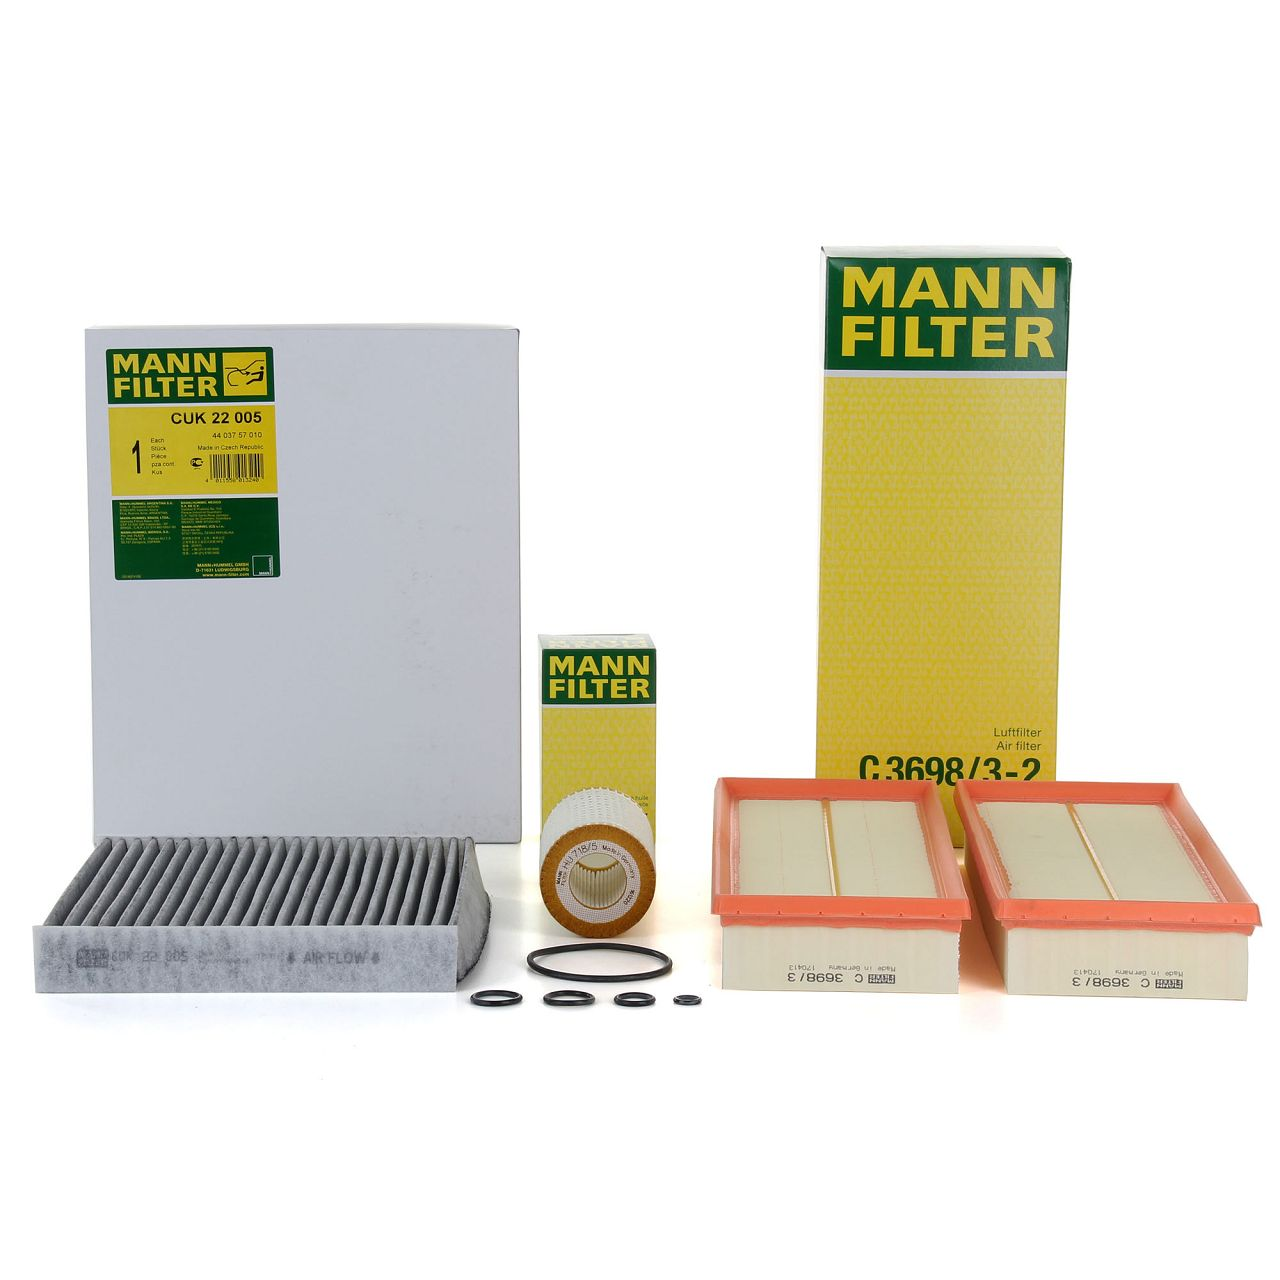 MANN Inspektionskit für MERCEDES W204 C230-350 W212 E300-500 X204 280-350